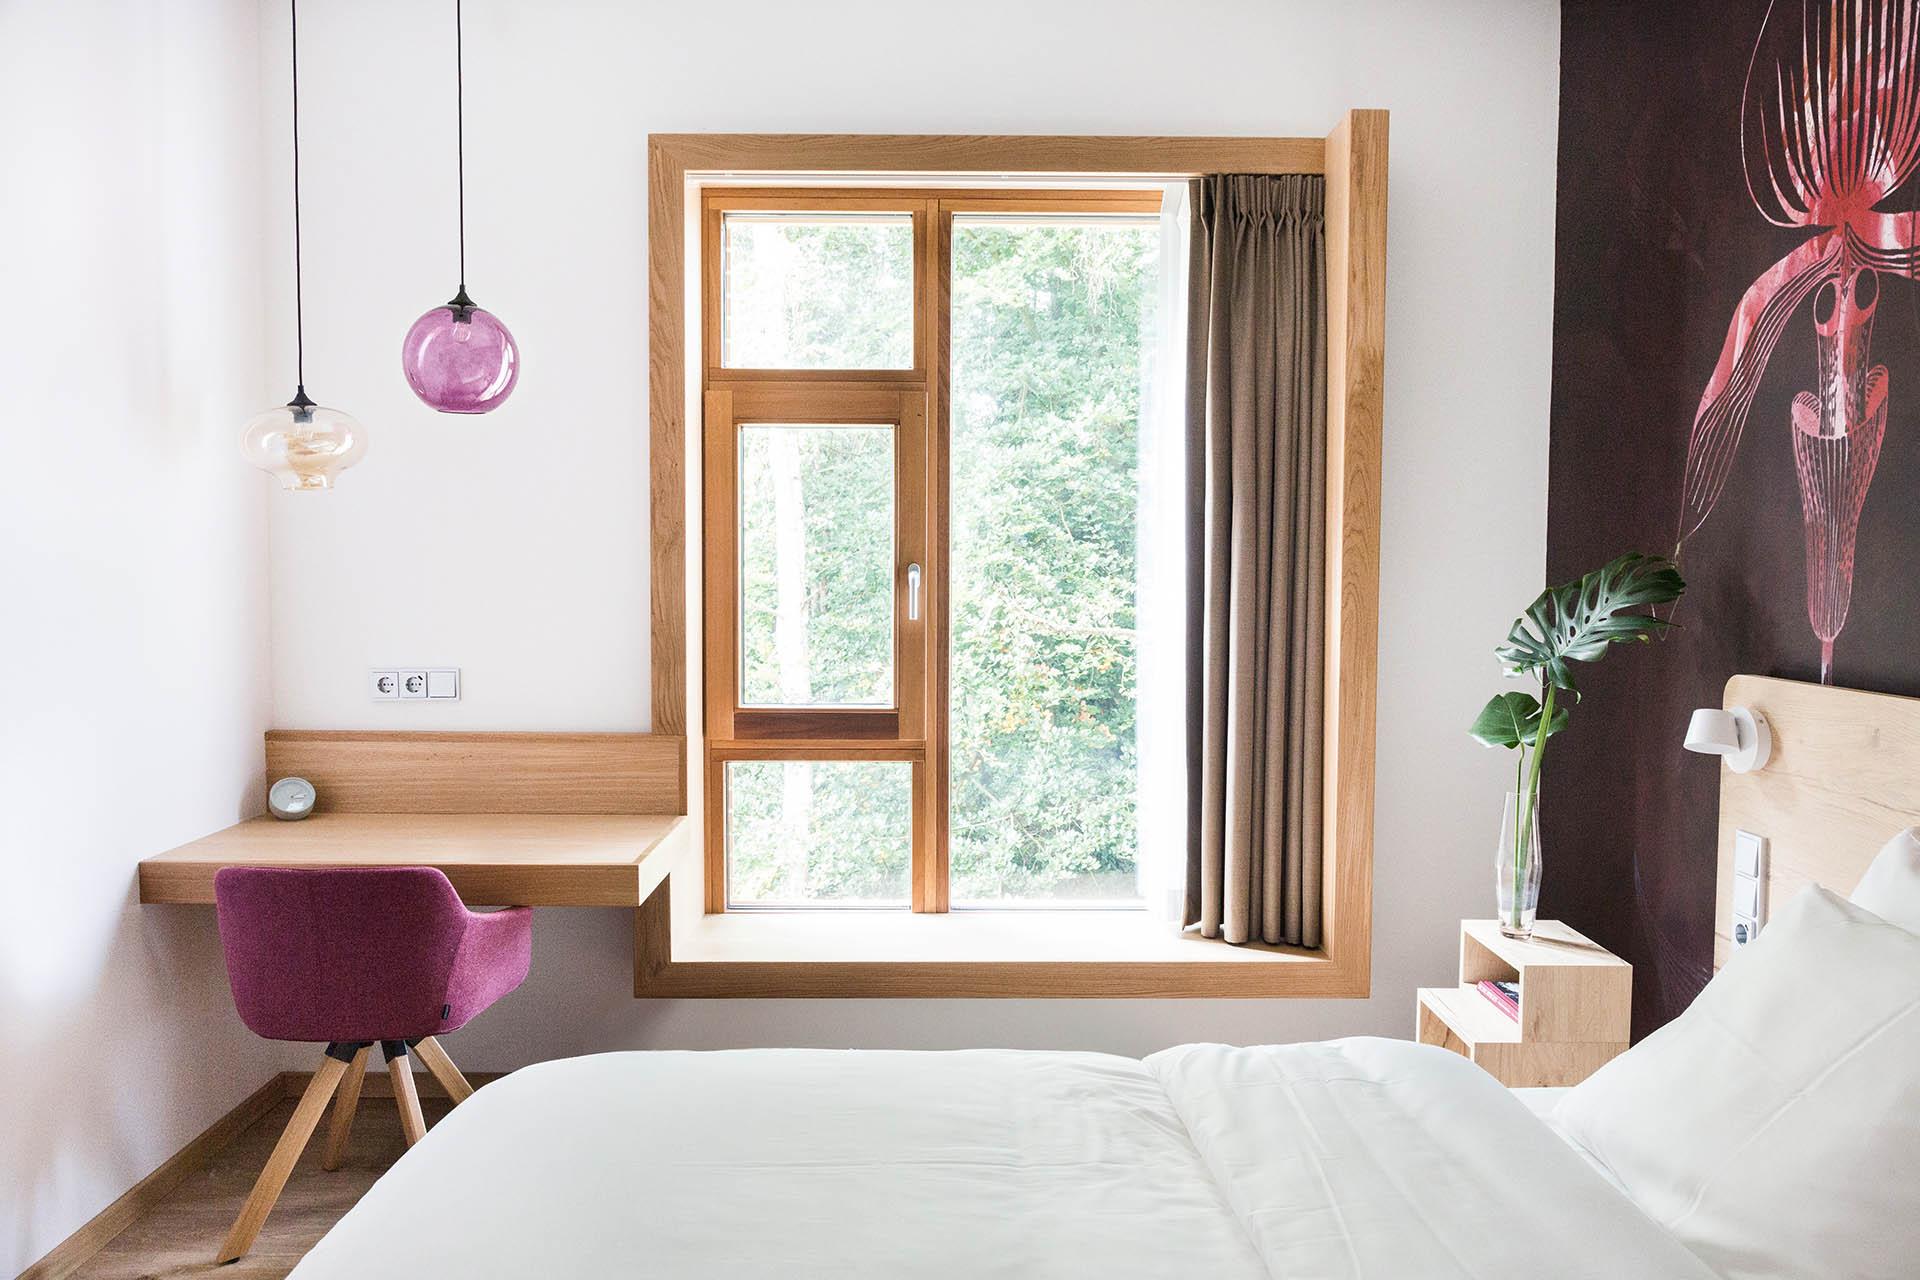 raamkozijn hotel bankje hout rood natuur windowsill hotelkamer hoteldesing